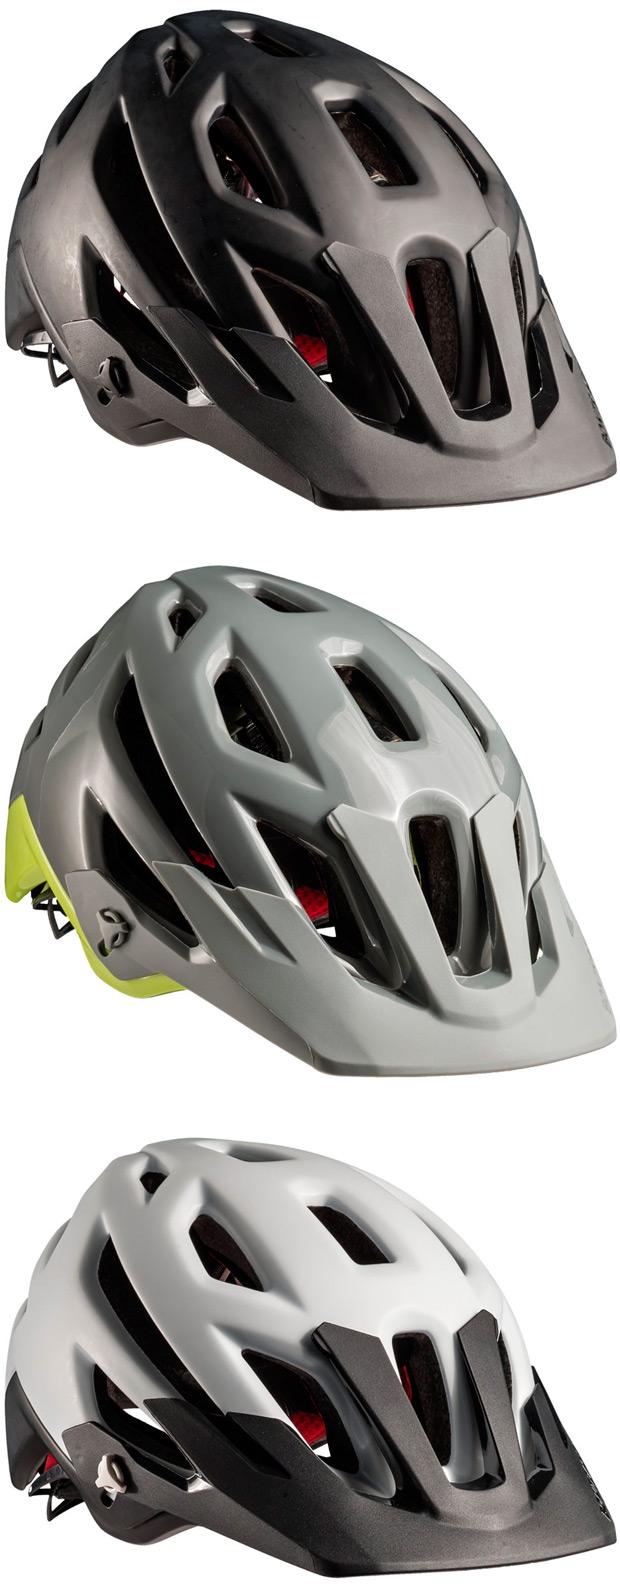 Bontrager Rally, un casco 'todo uso' para rodar con la mejor protección